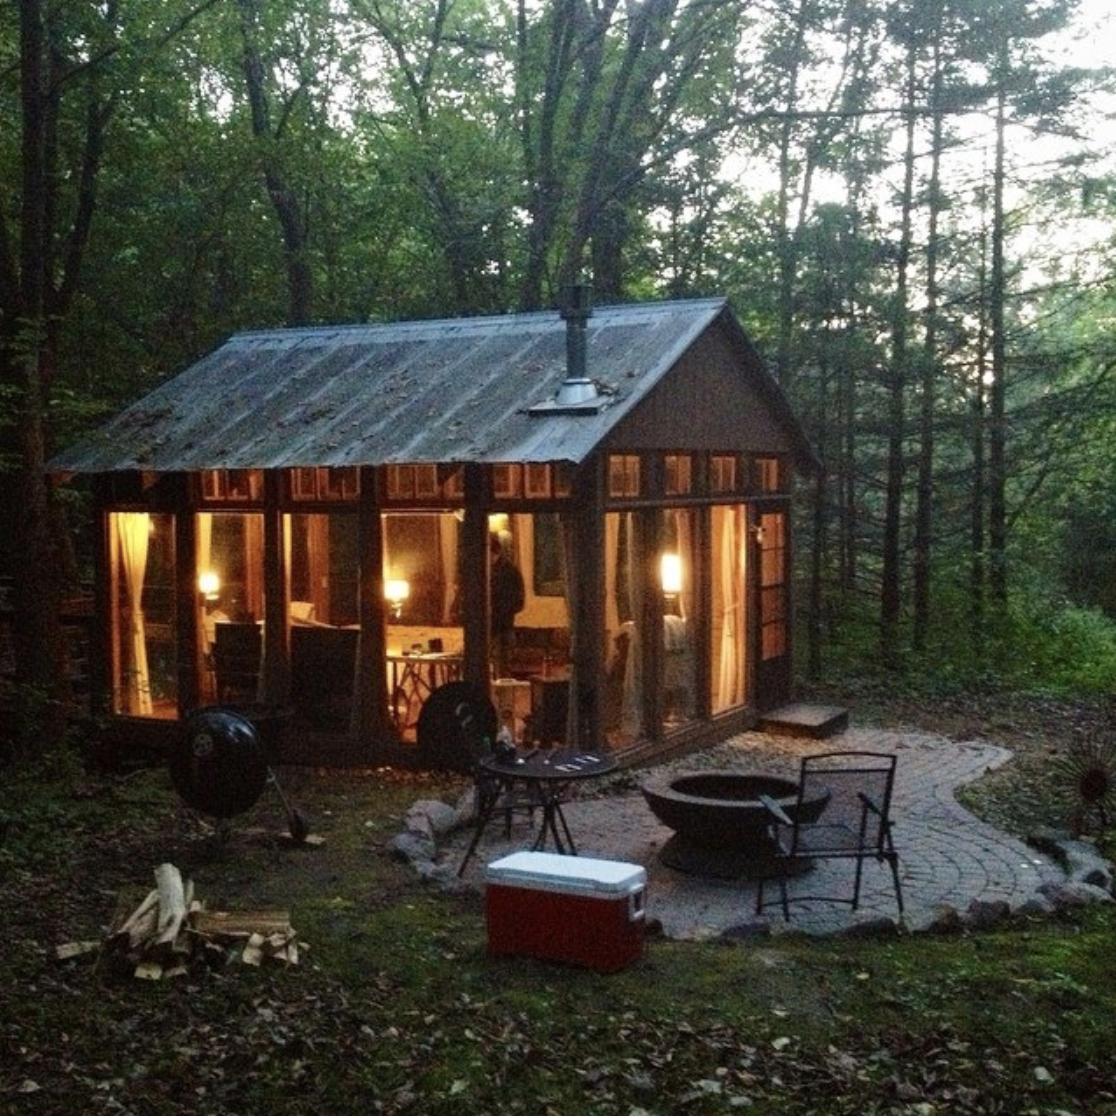 Image via Candlewood Cabins